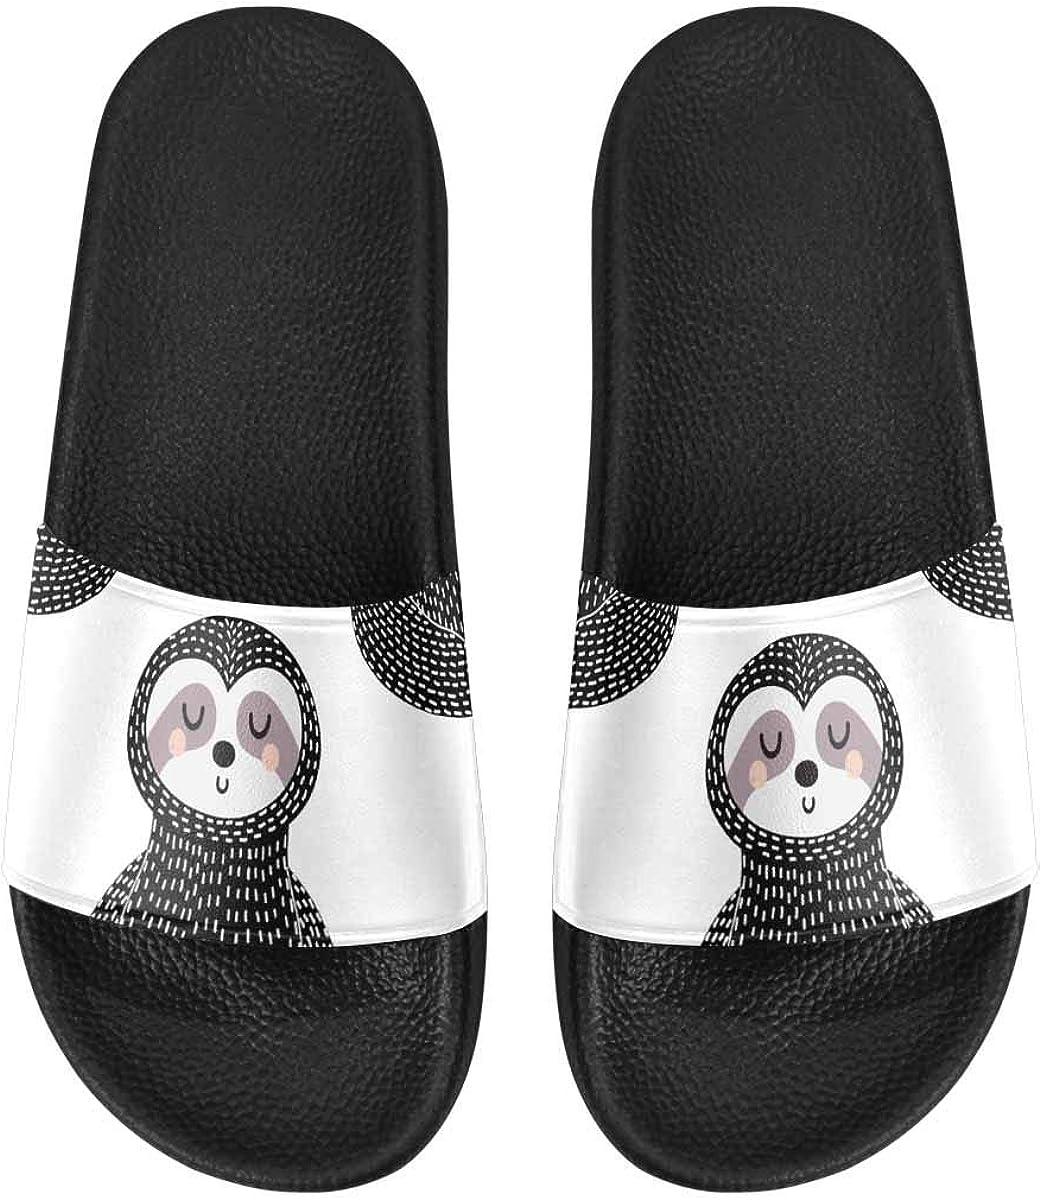 InterestPrint Women's Lightweight Slipper Sandals for Shower Sloth Boho Palm Tree Leaf